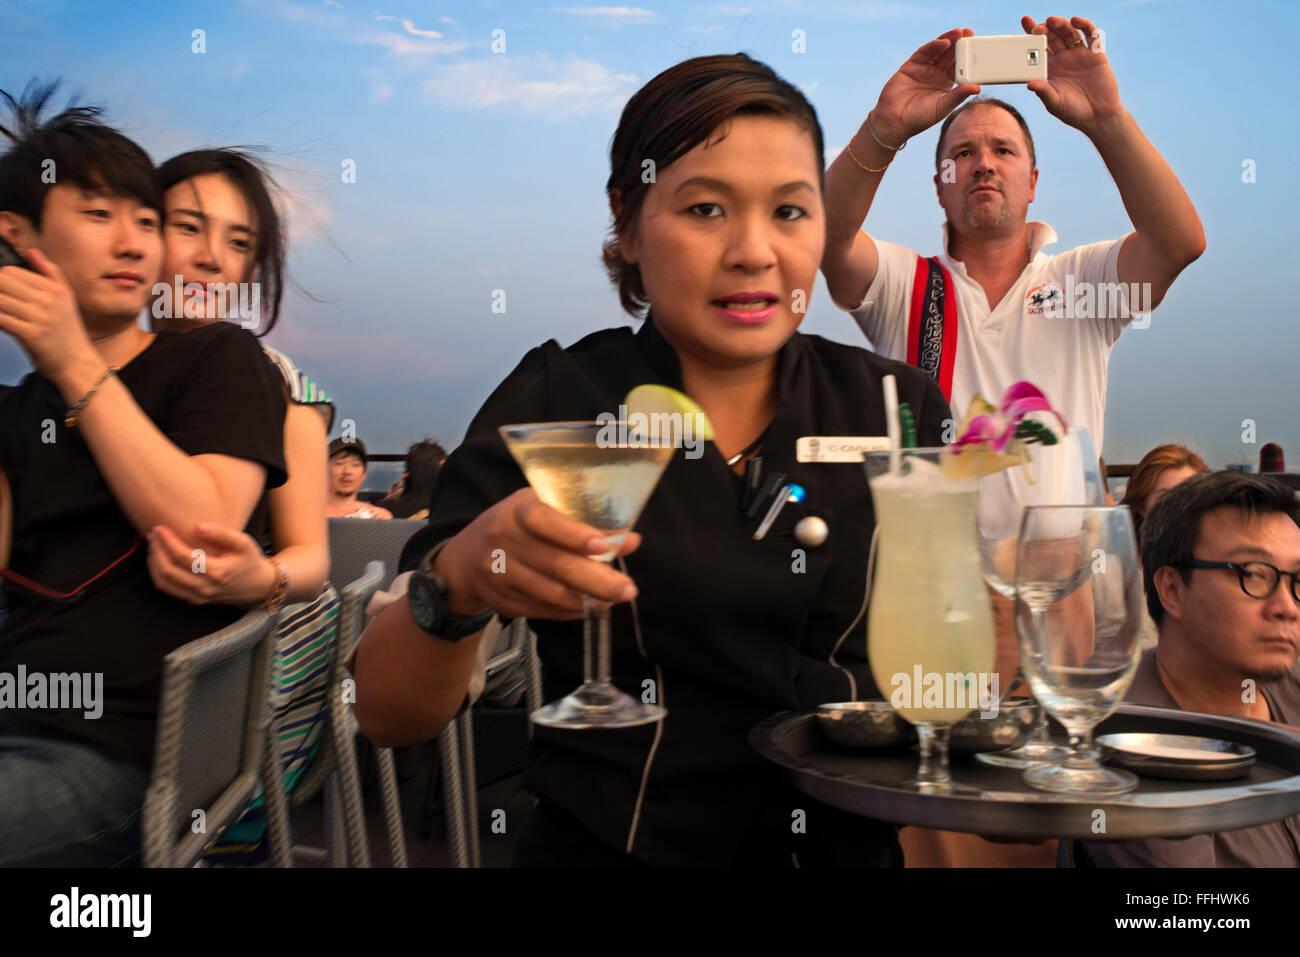 Waitress with cocktails in her hand. Banyan Tree Rooftop Vertigo & Moon Bar, Restaurant, , Bangkok , Thailand. - Stock Image